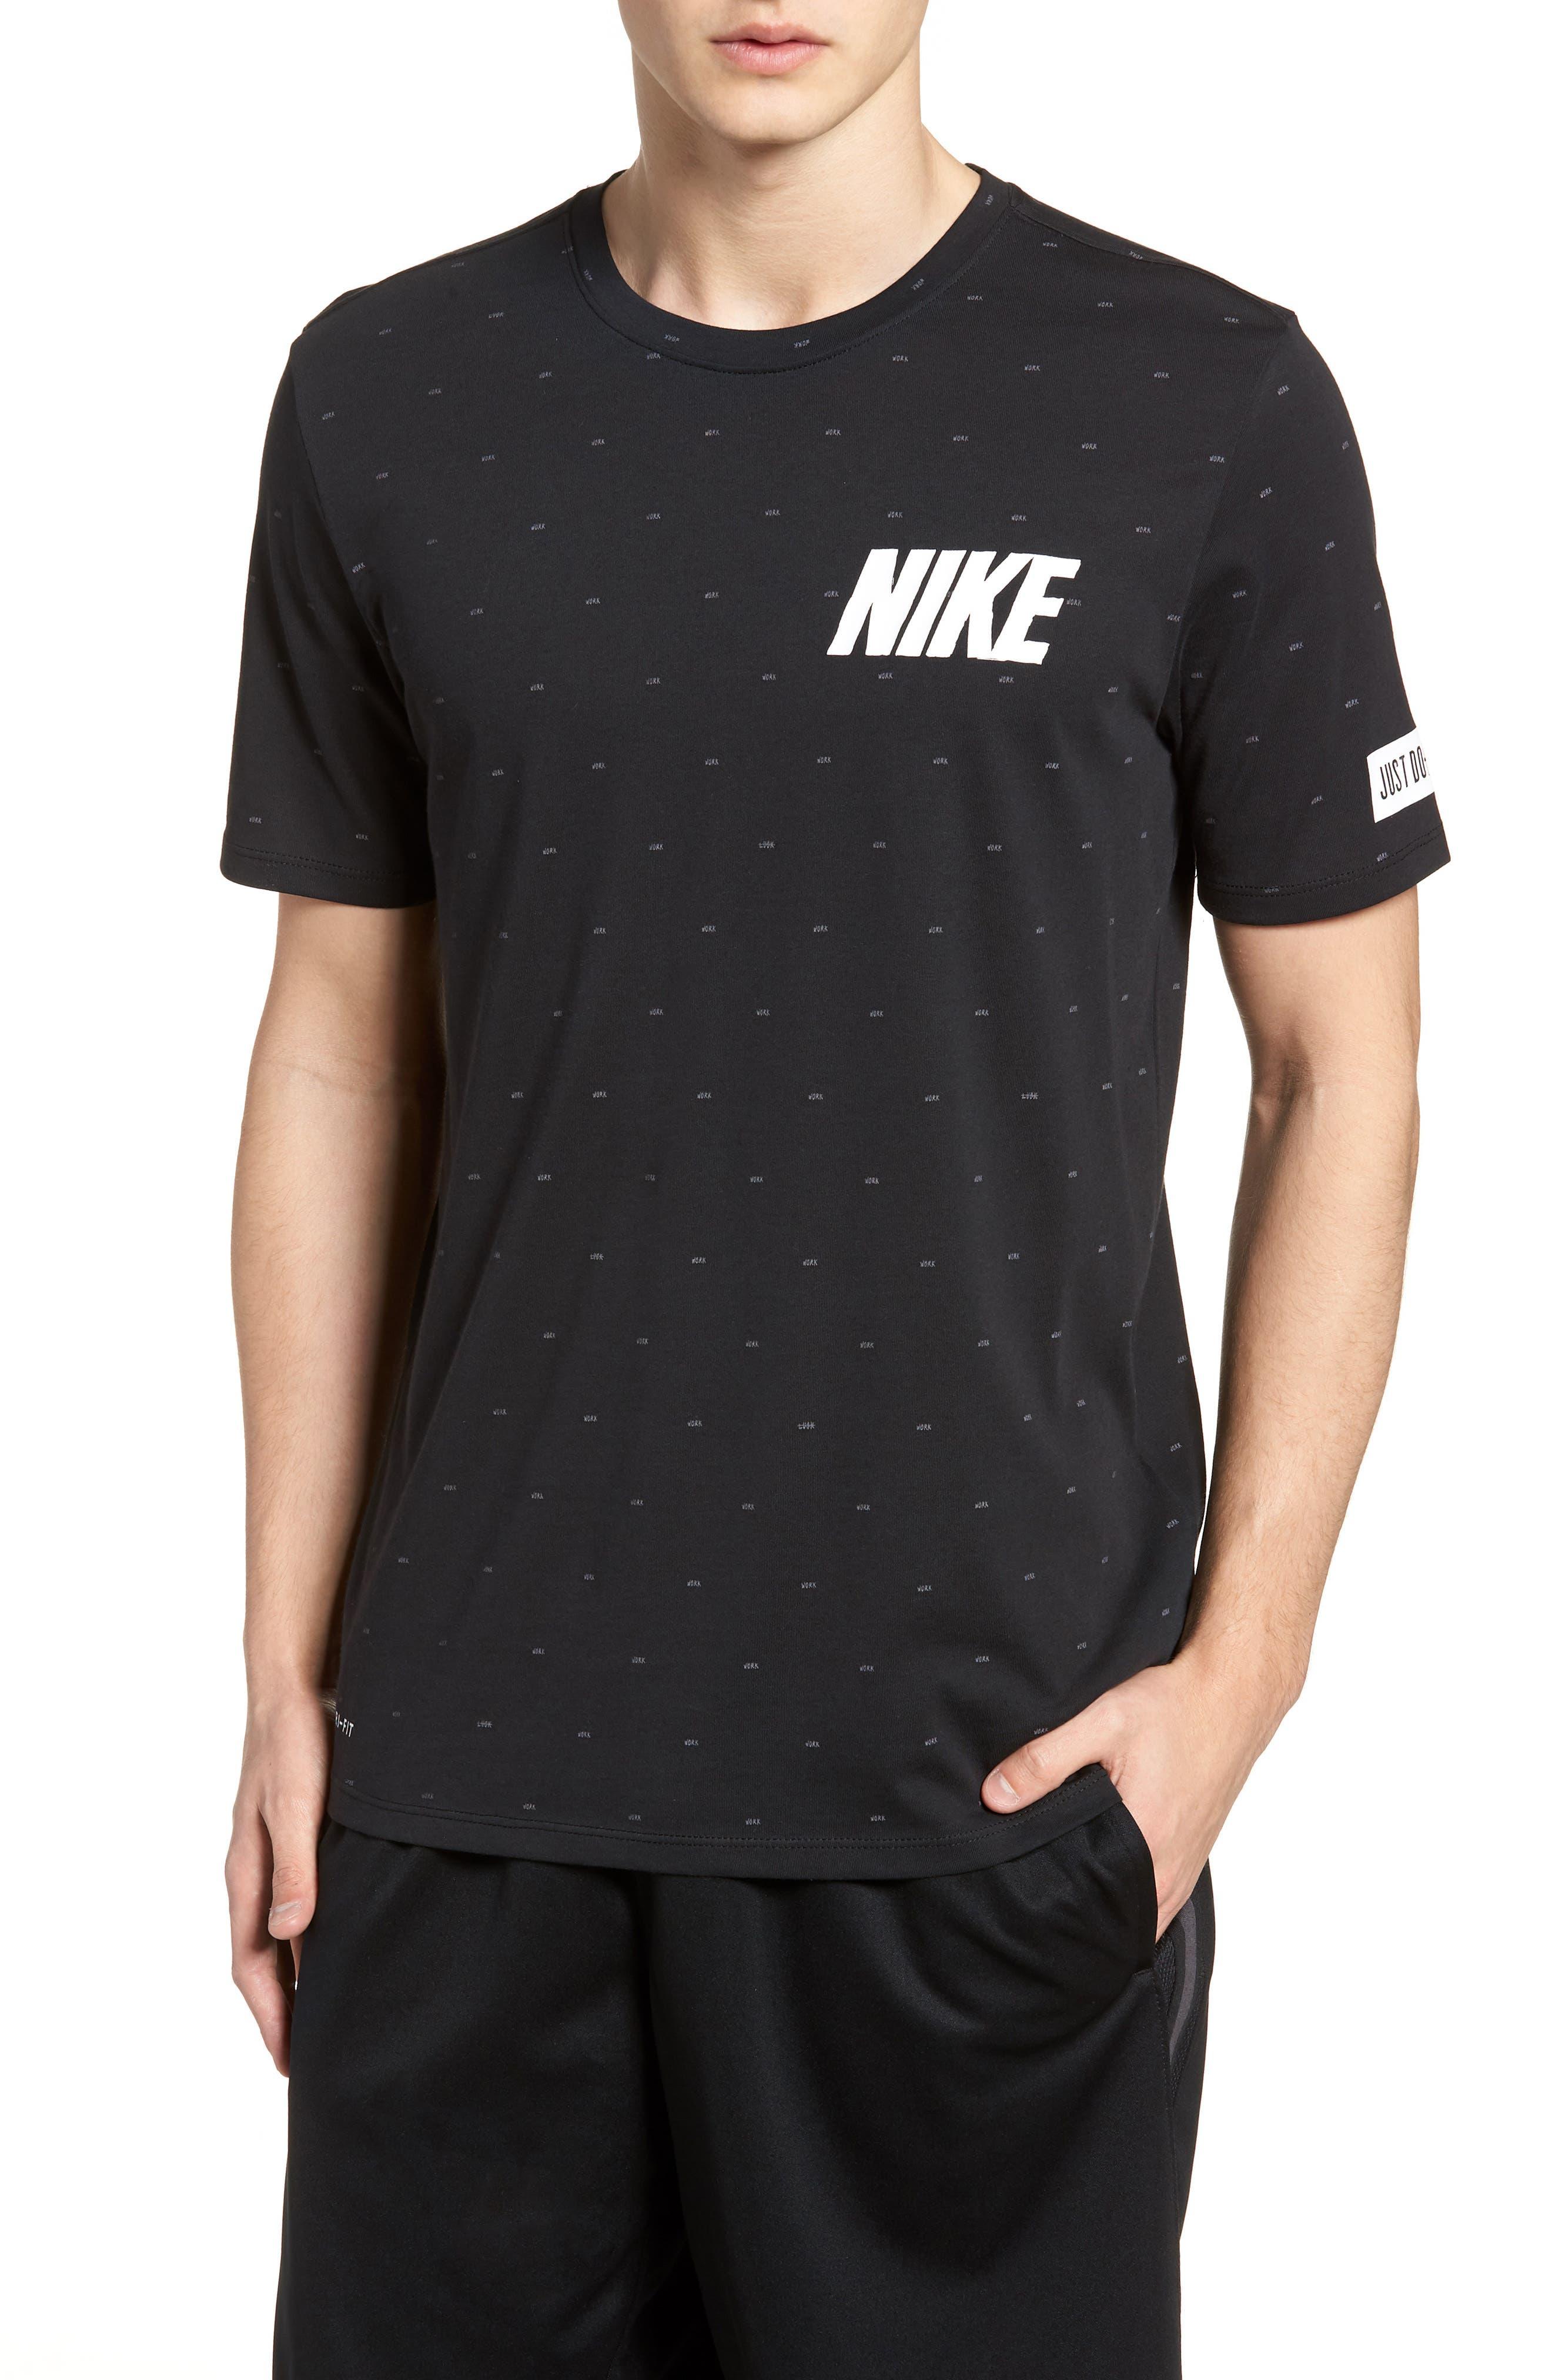 Nike Dry Print T-Shirt Black